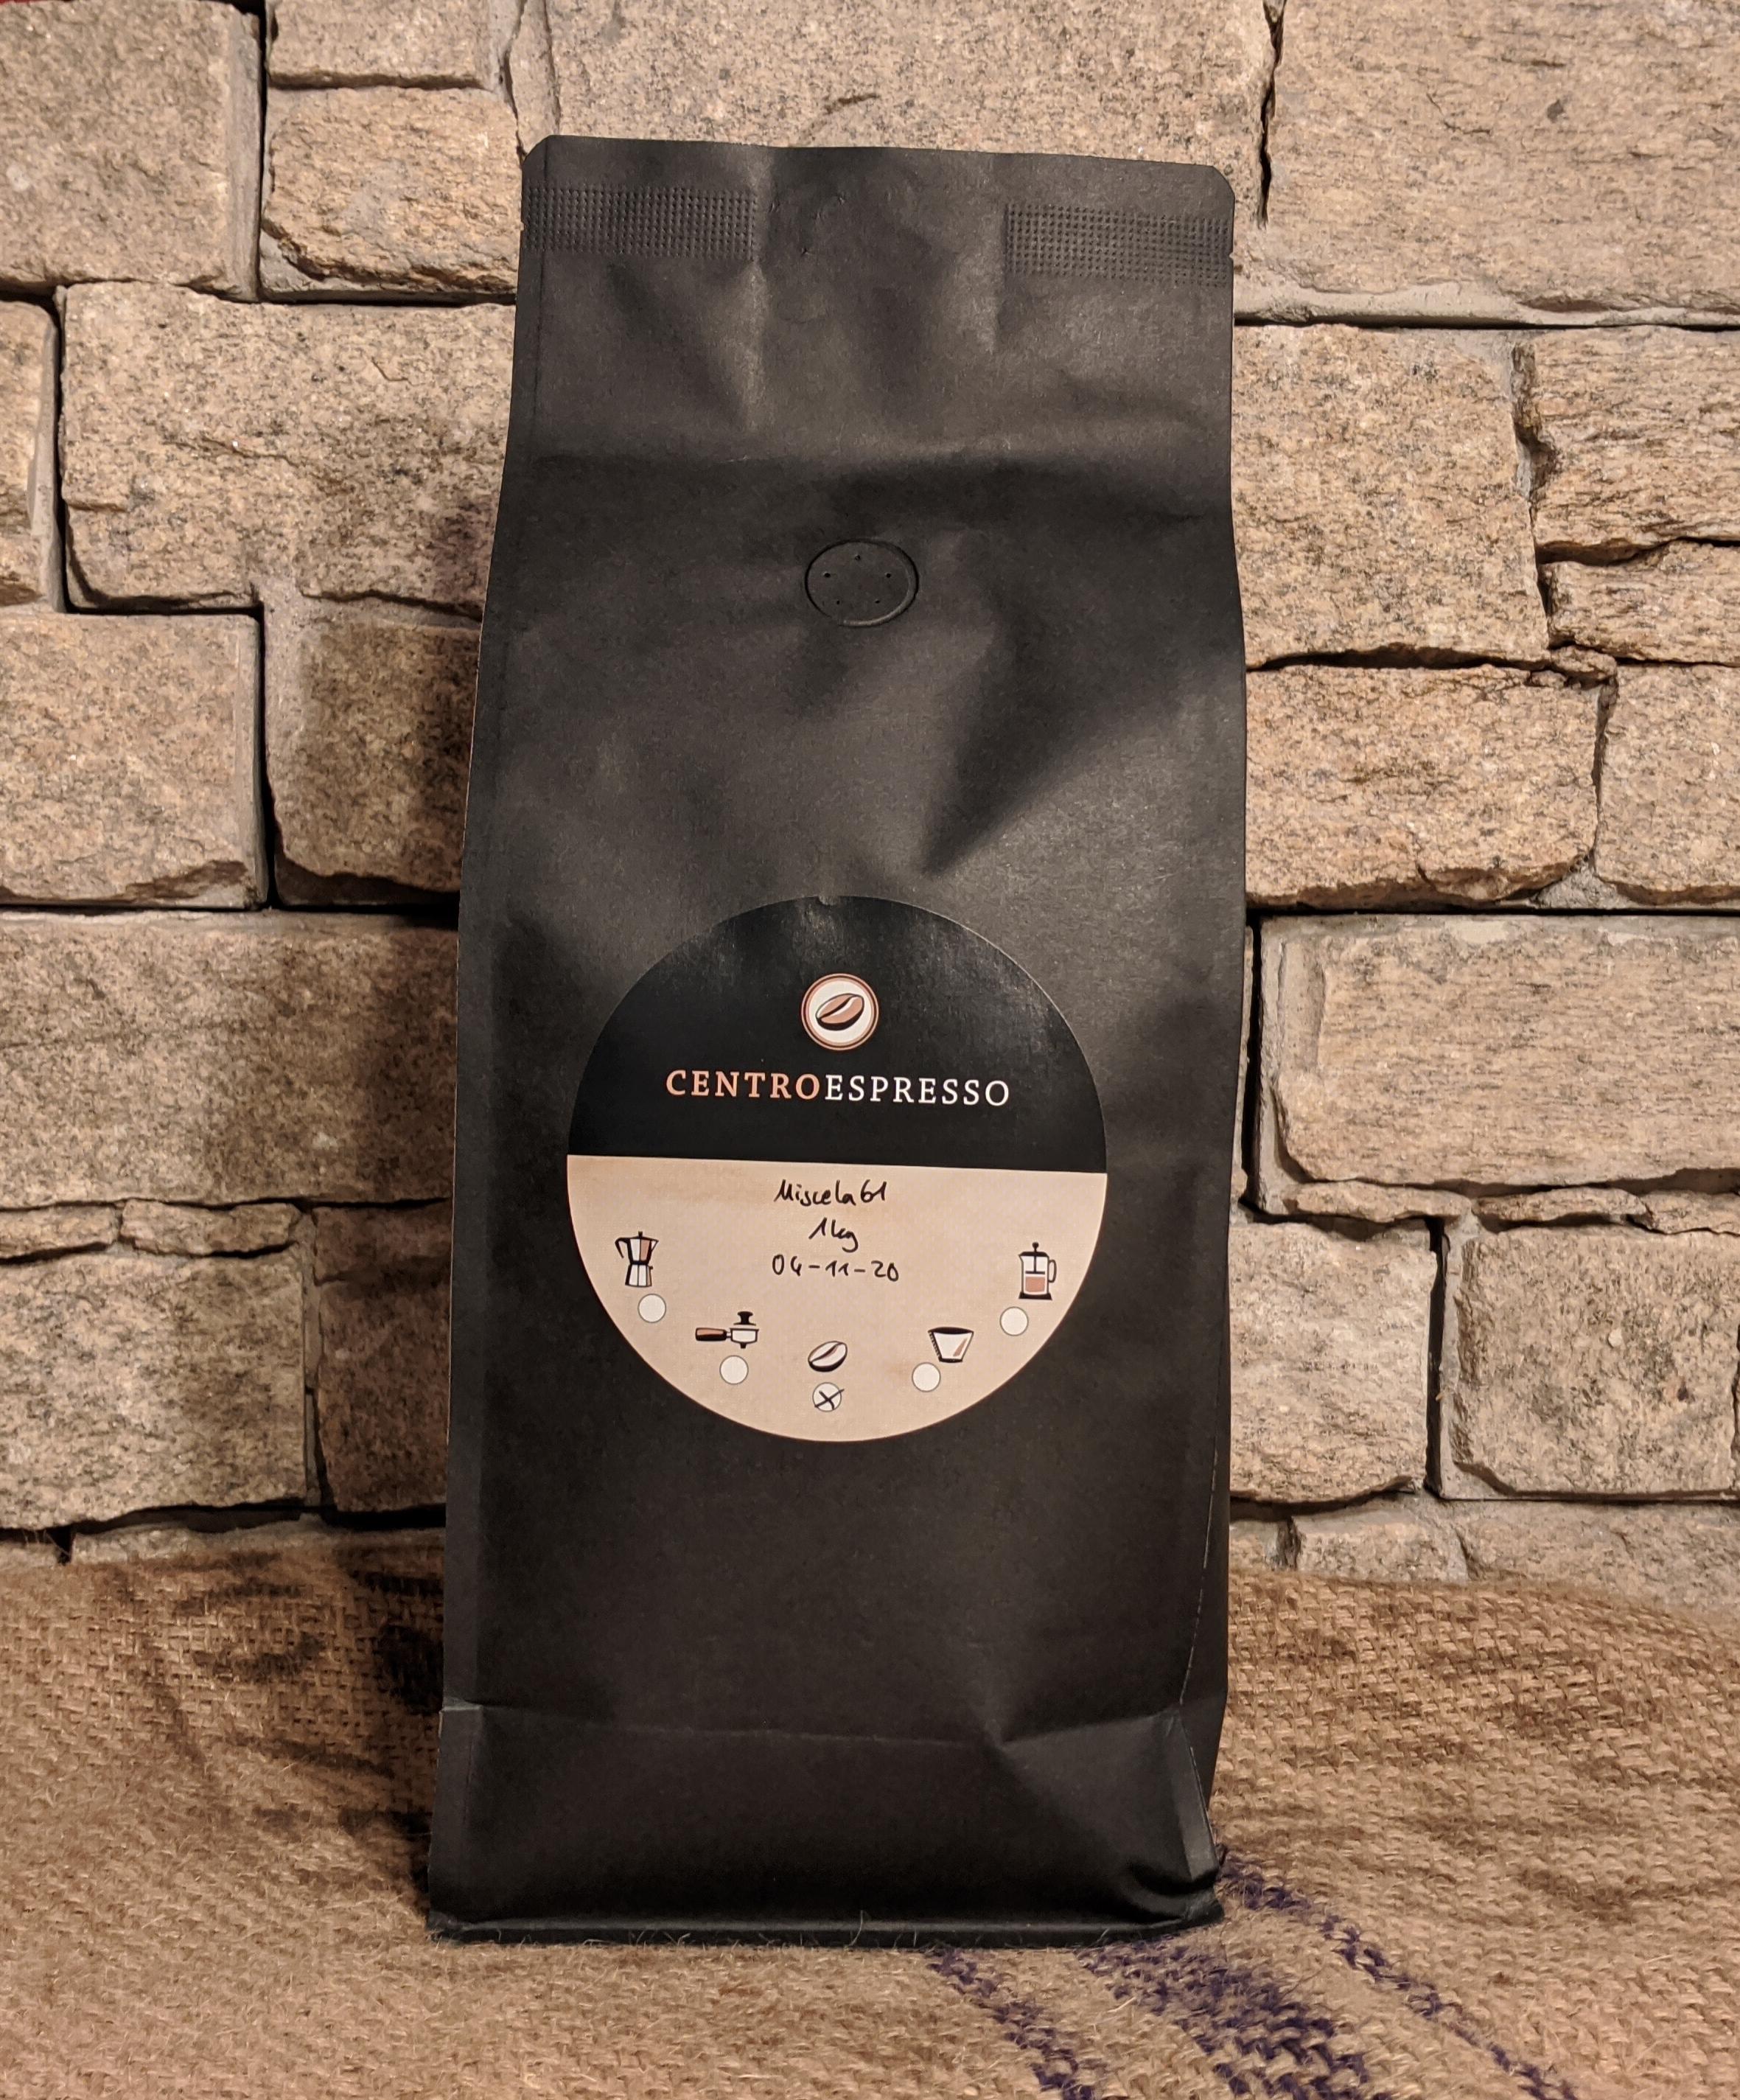 1 Kg Centro Espresso miscela 61 organic